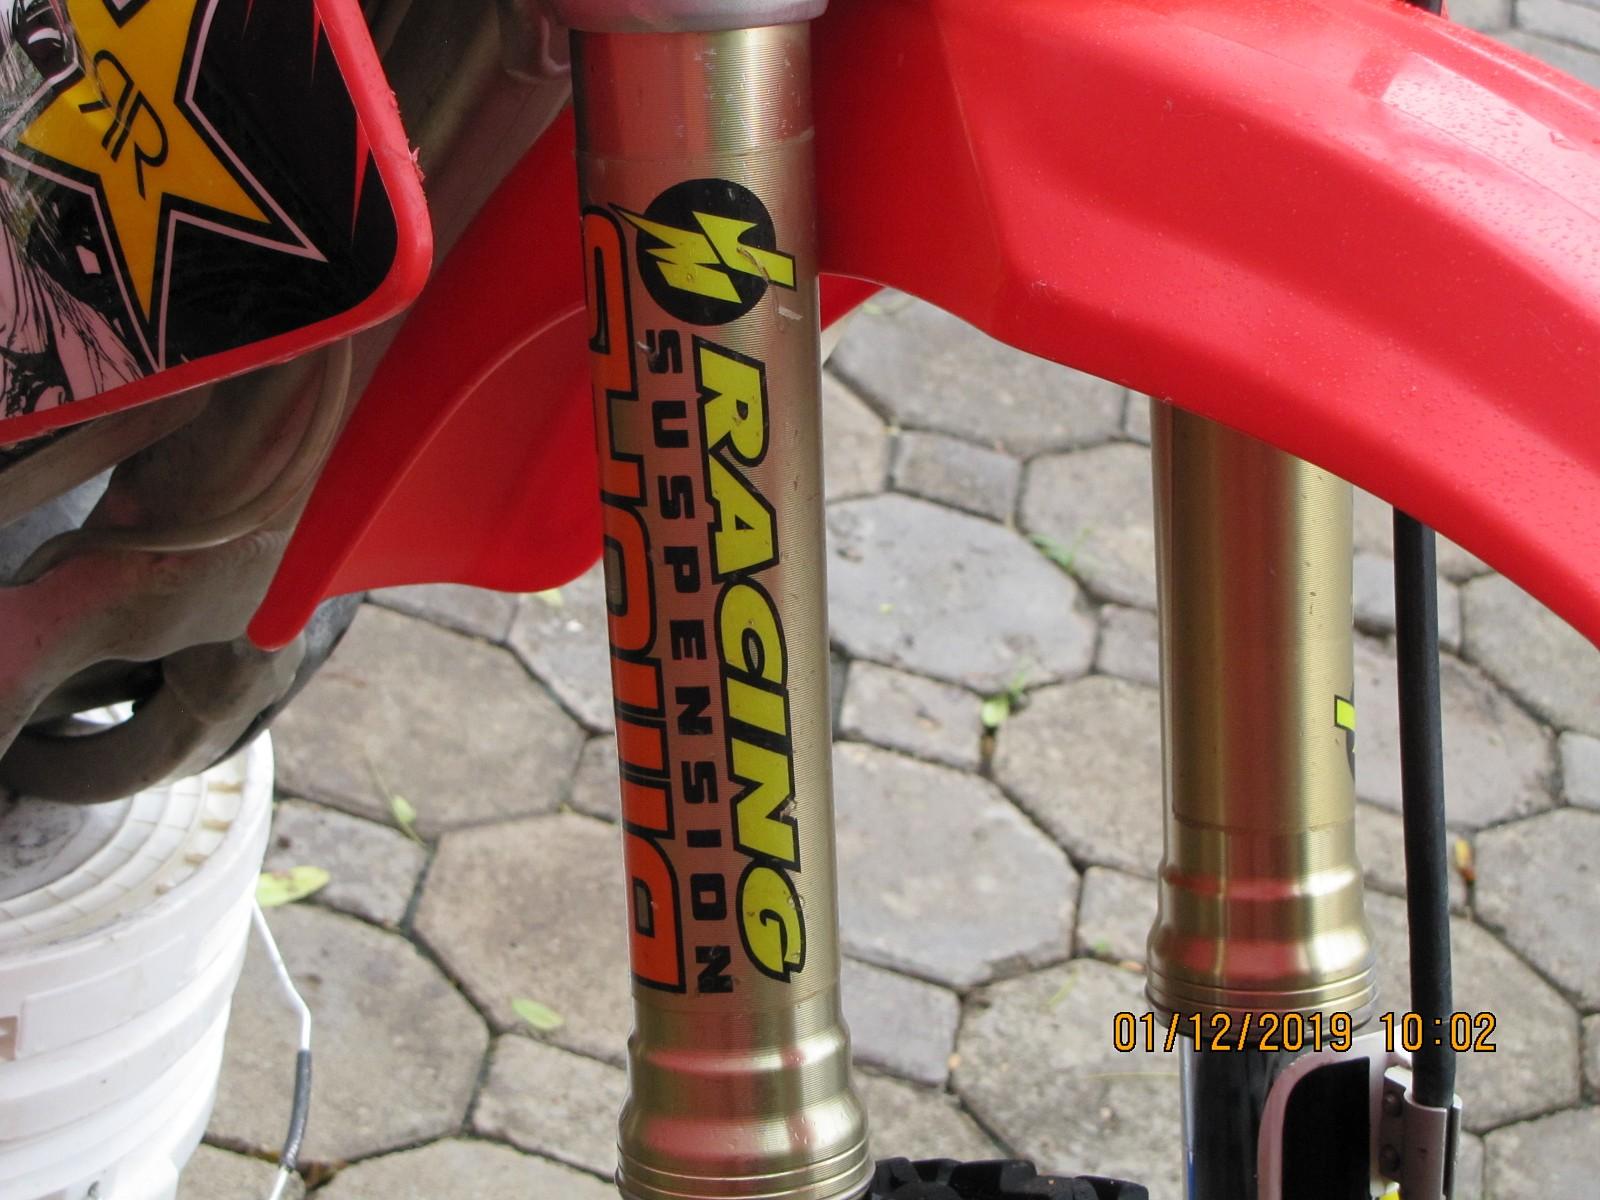 IMG 0018 - banny wailer - Motocross Pictures - Vital MX